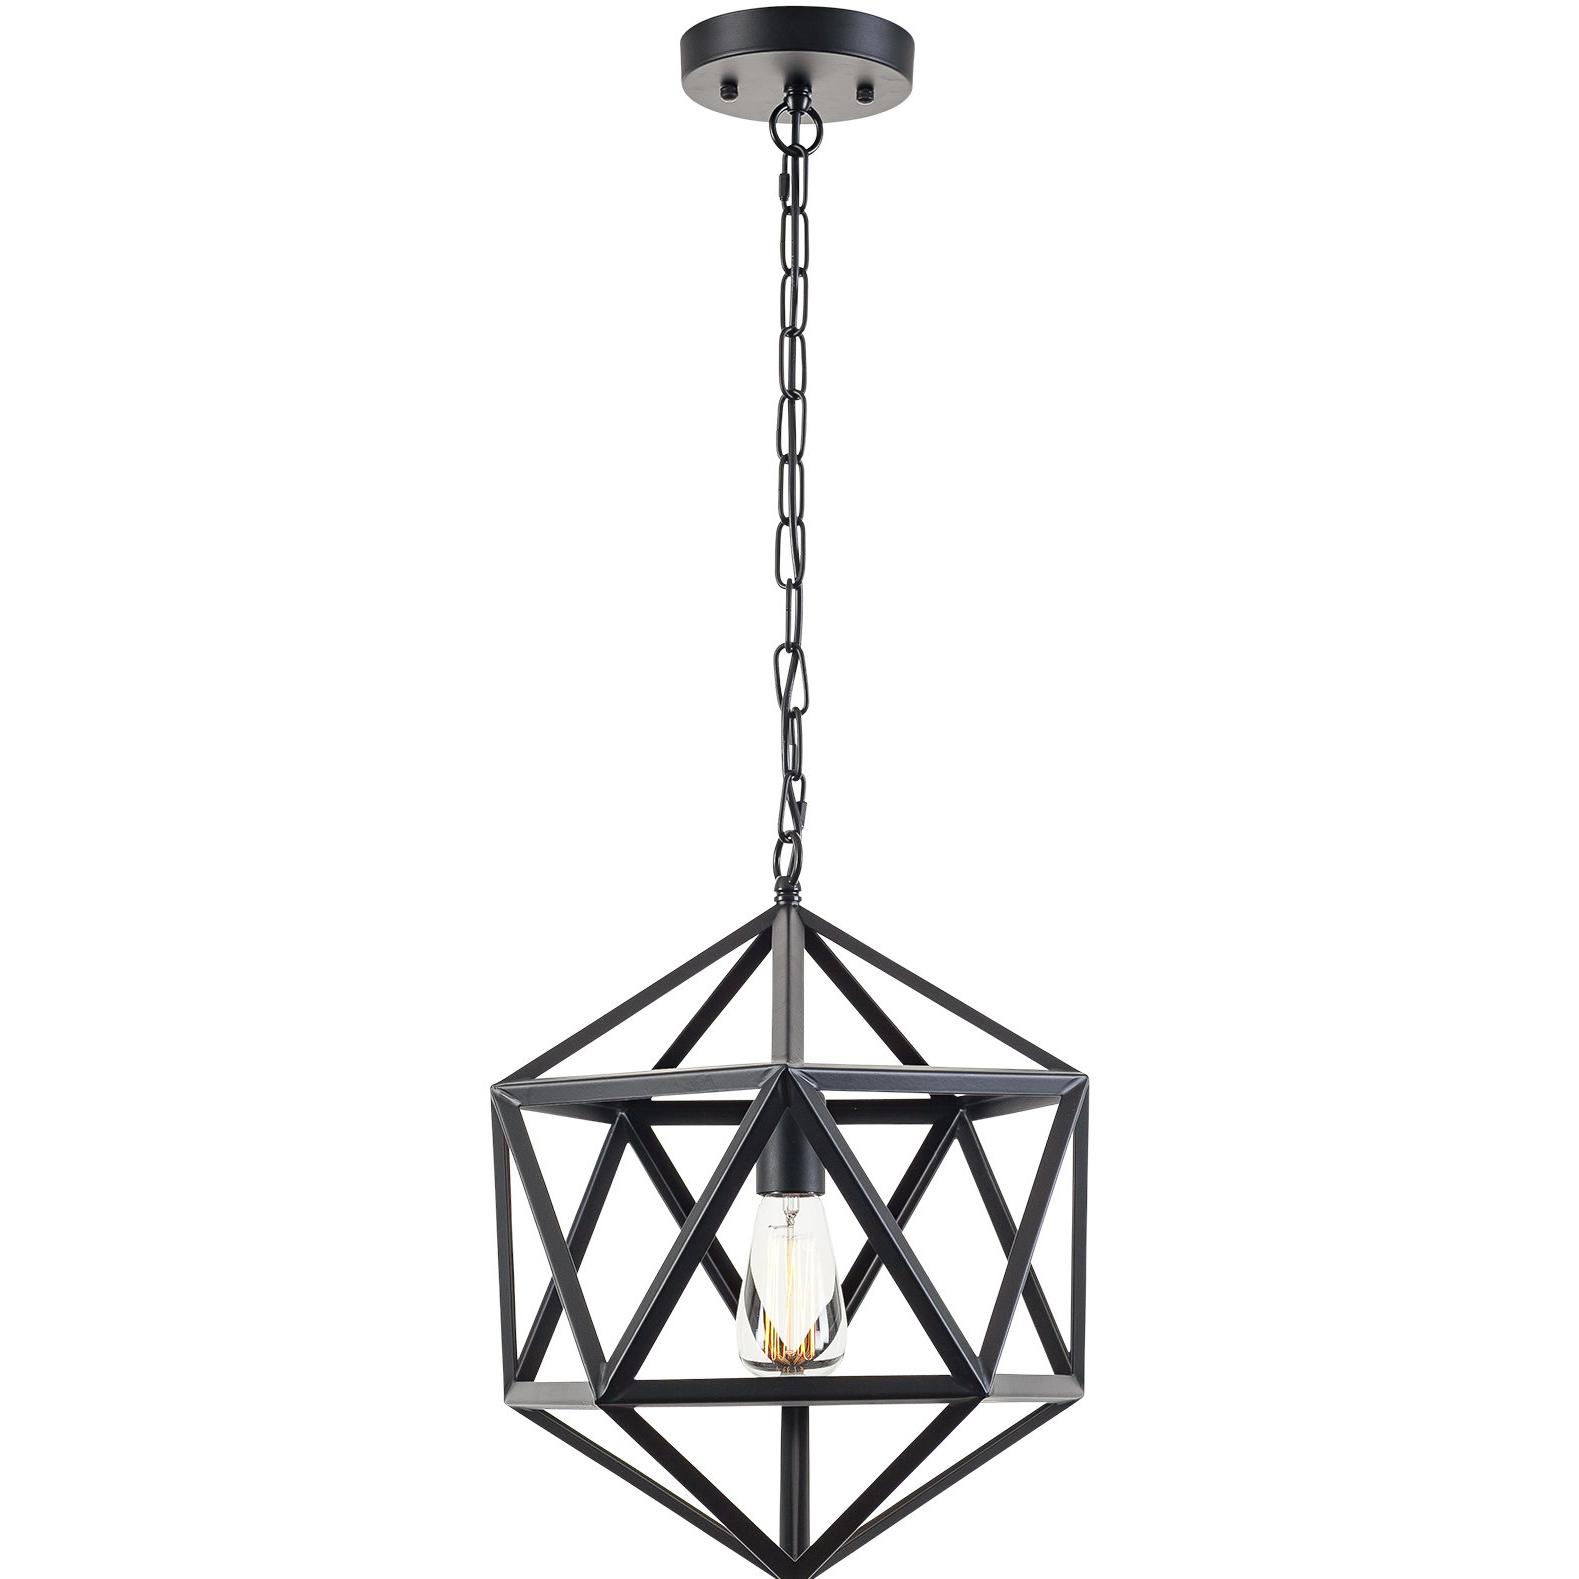 Widely Used Delon 1 Light Lantern Geometric Pendants Within 1 Light Lantern Geometric Pendant (View 6 of 25)